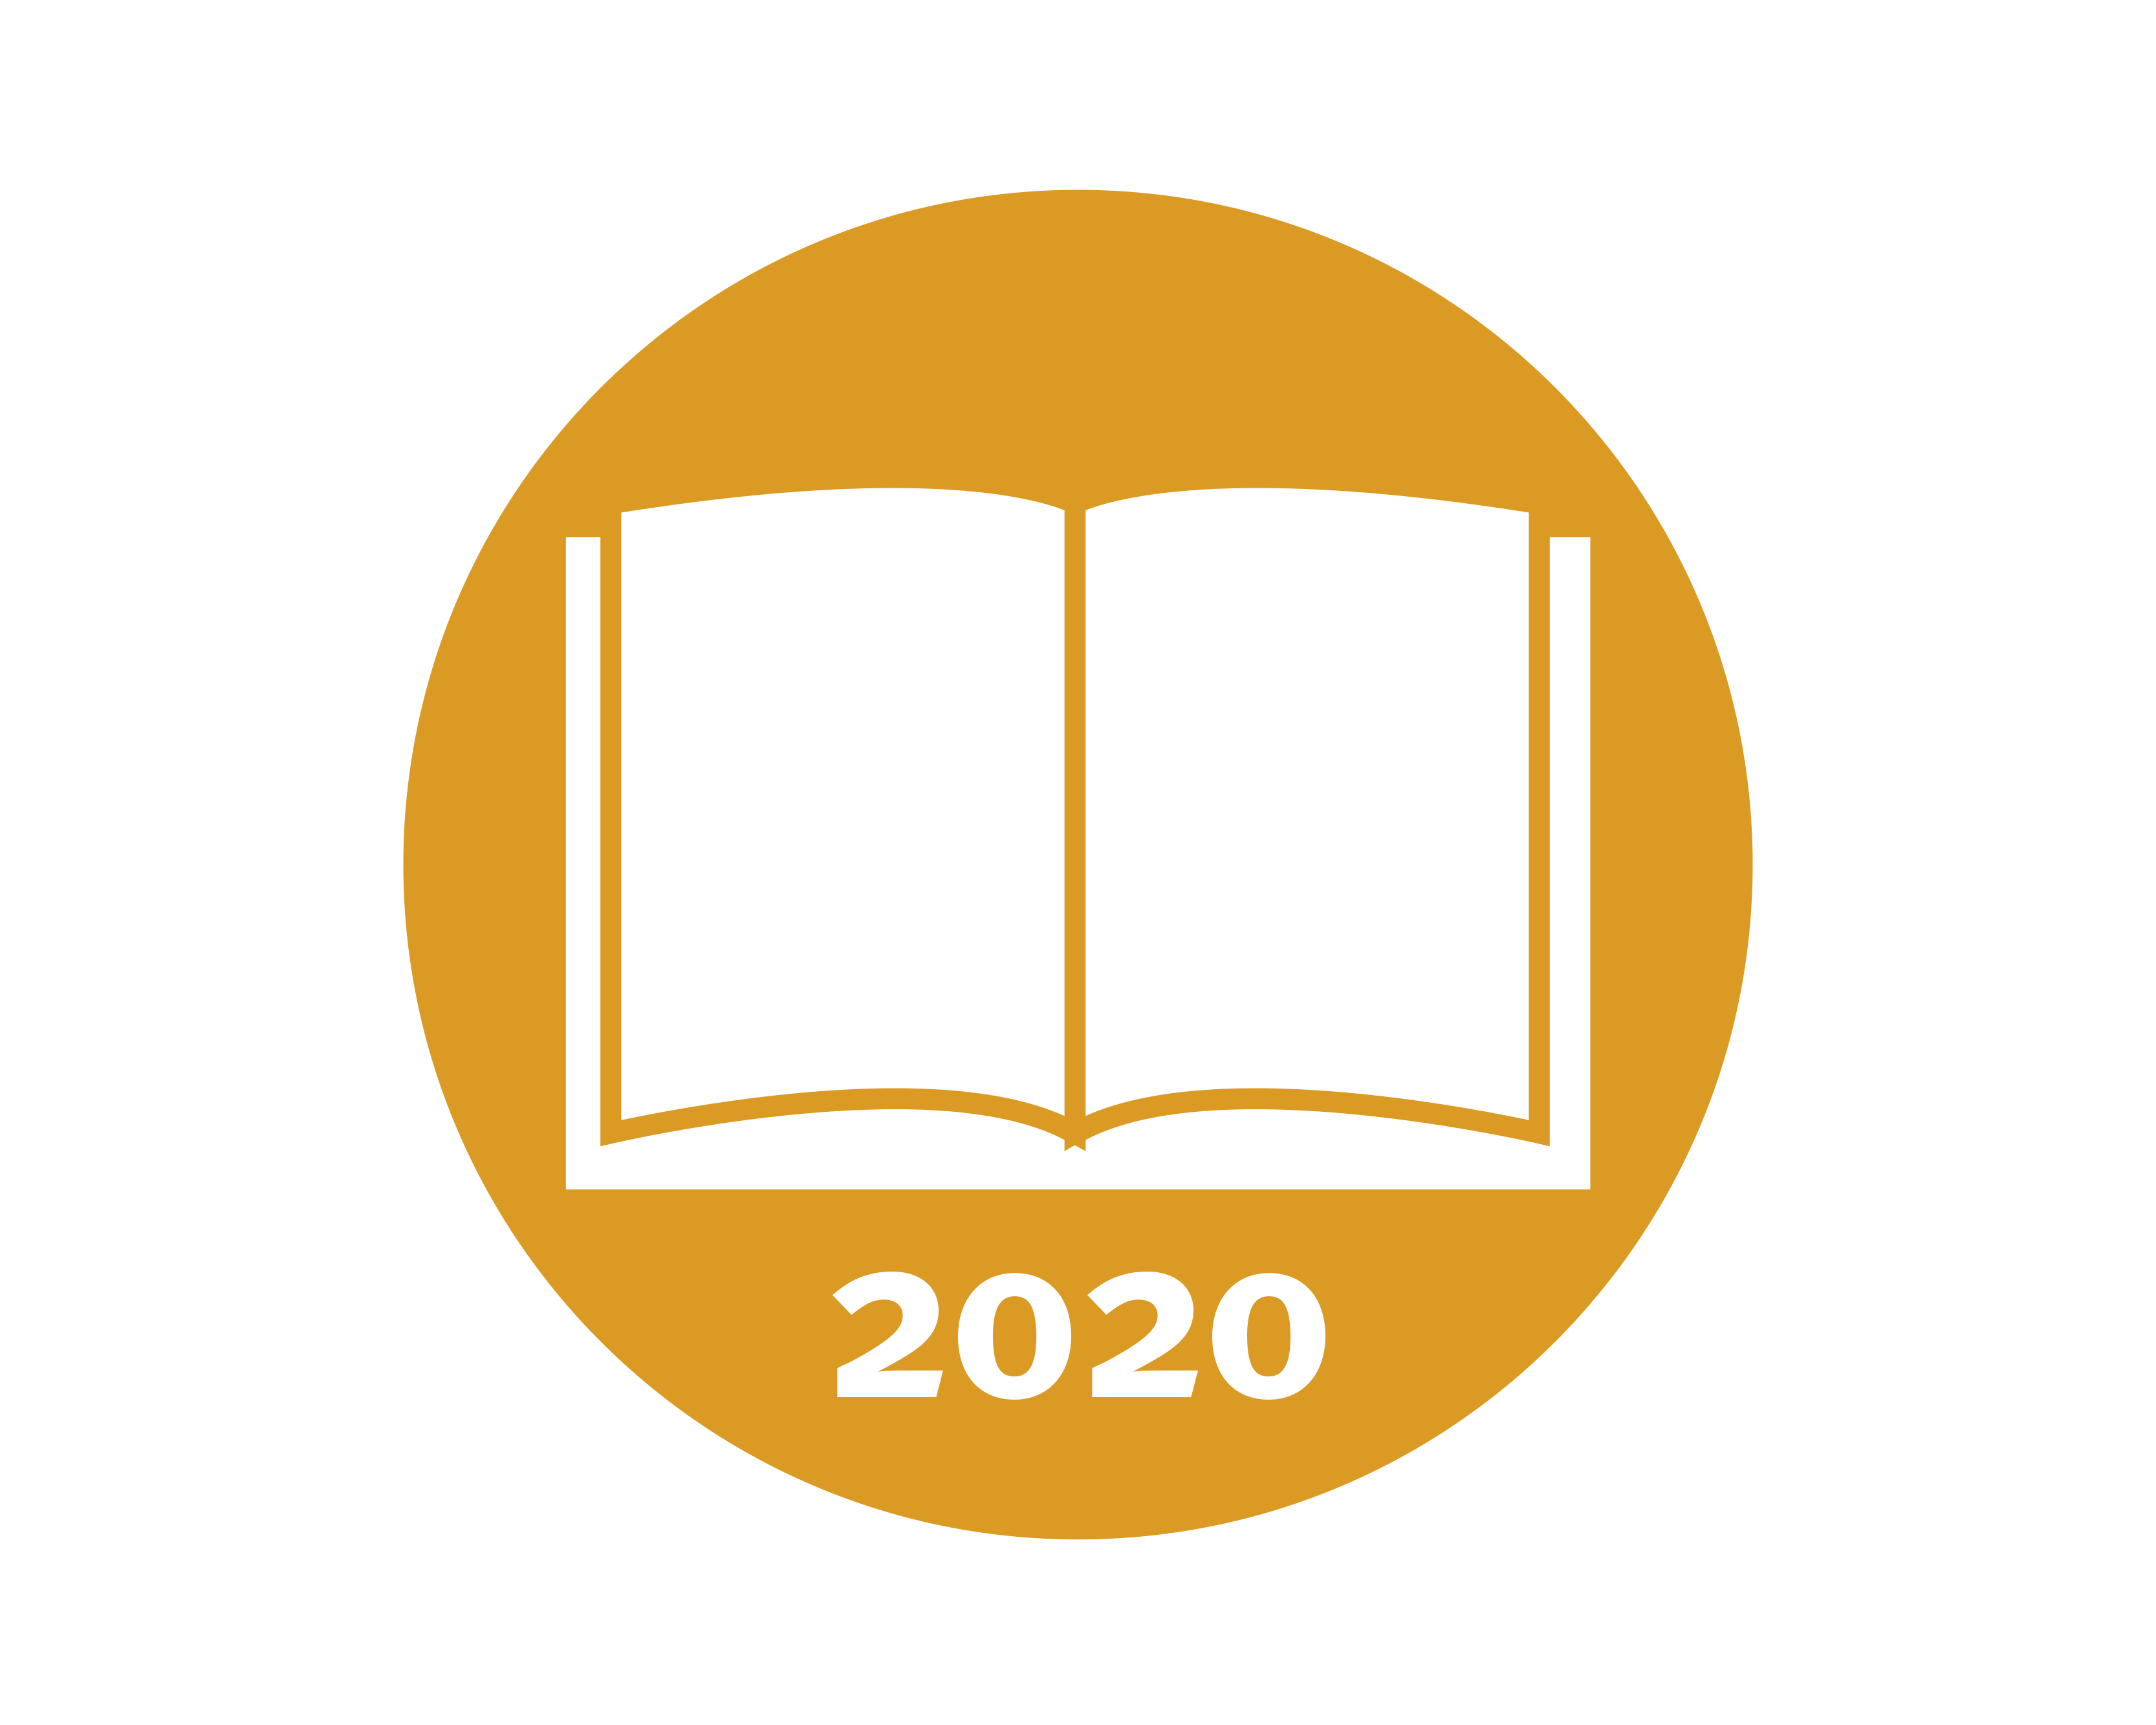 Civiltà del bere 2020